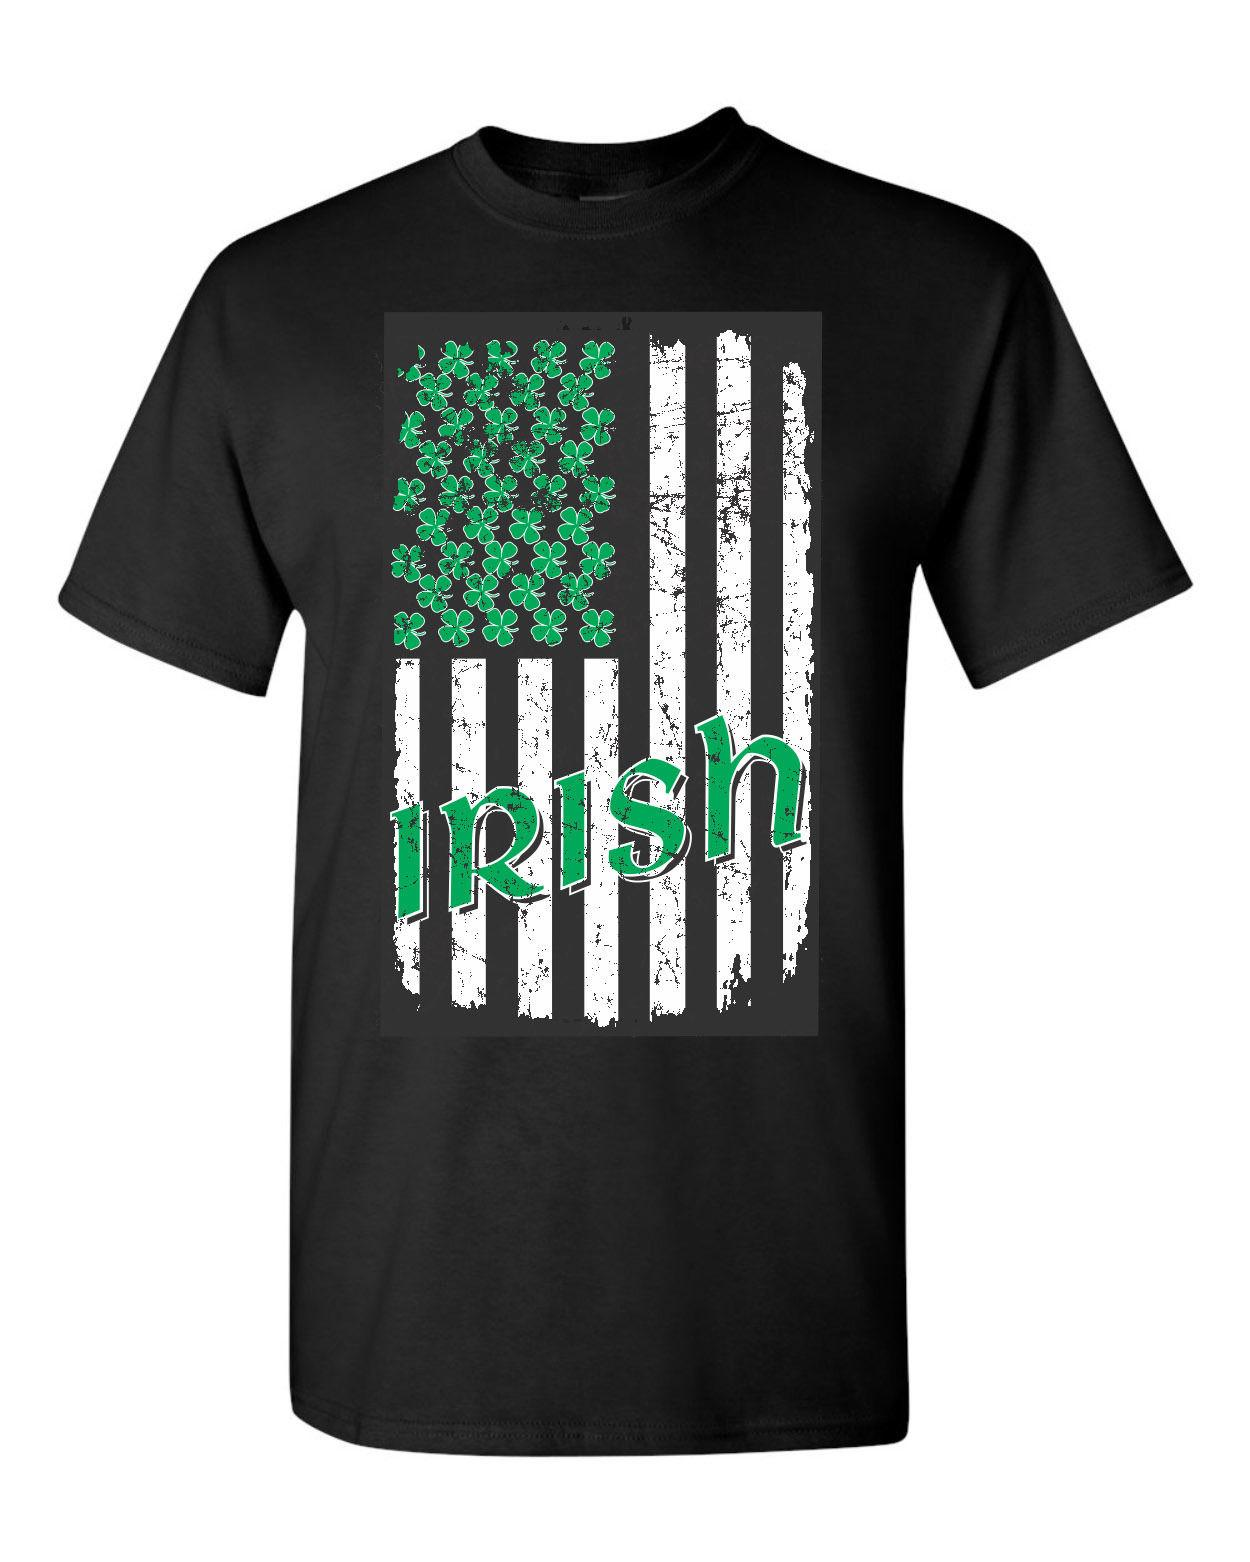 07a00e1ce St. Patrick'S Day Irish USA Flag W/ Green Shamrock'S Stars Men'S Tee Shirt  1587 Men'S Short Sleeve Cotton Printed T Shirt Vintage T Shirts Band T  Shirts ...